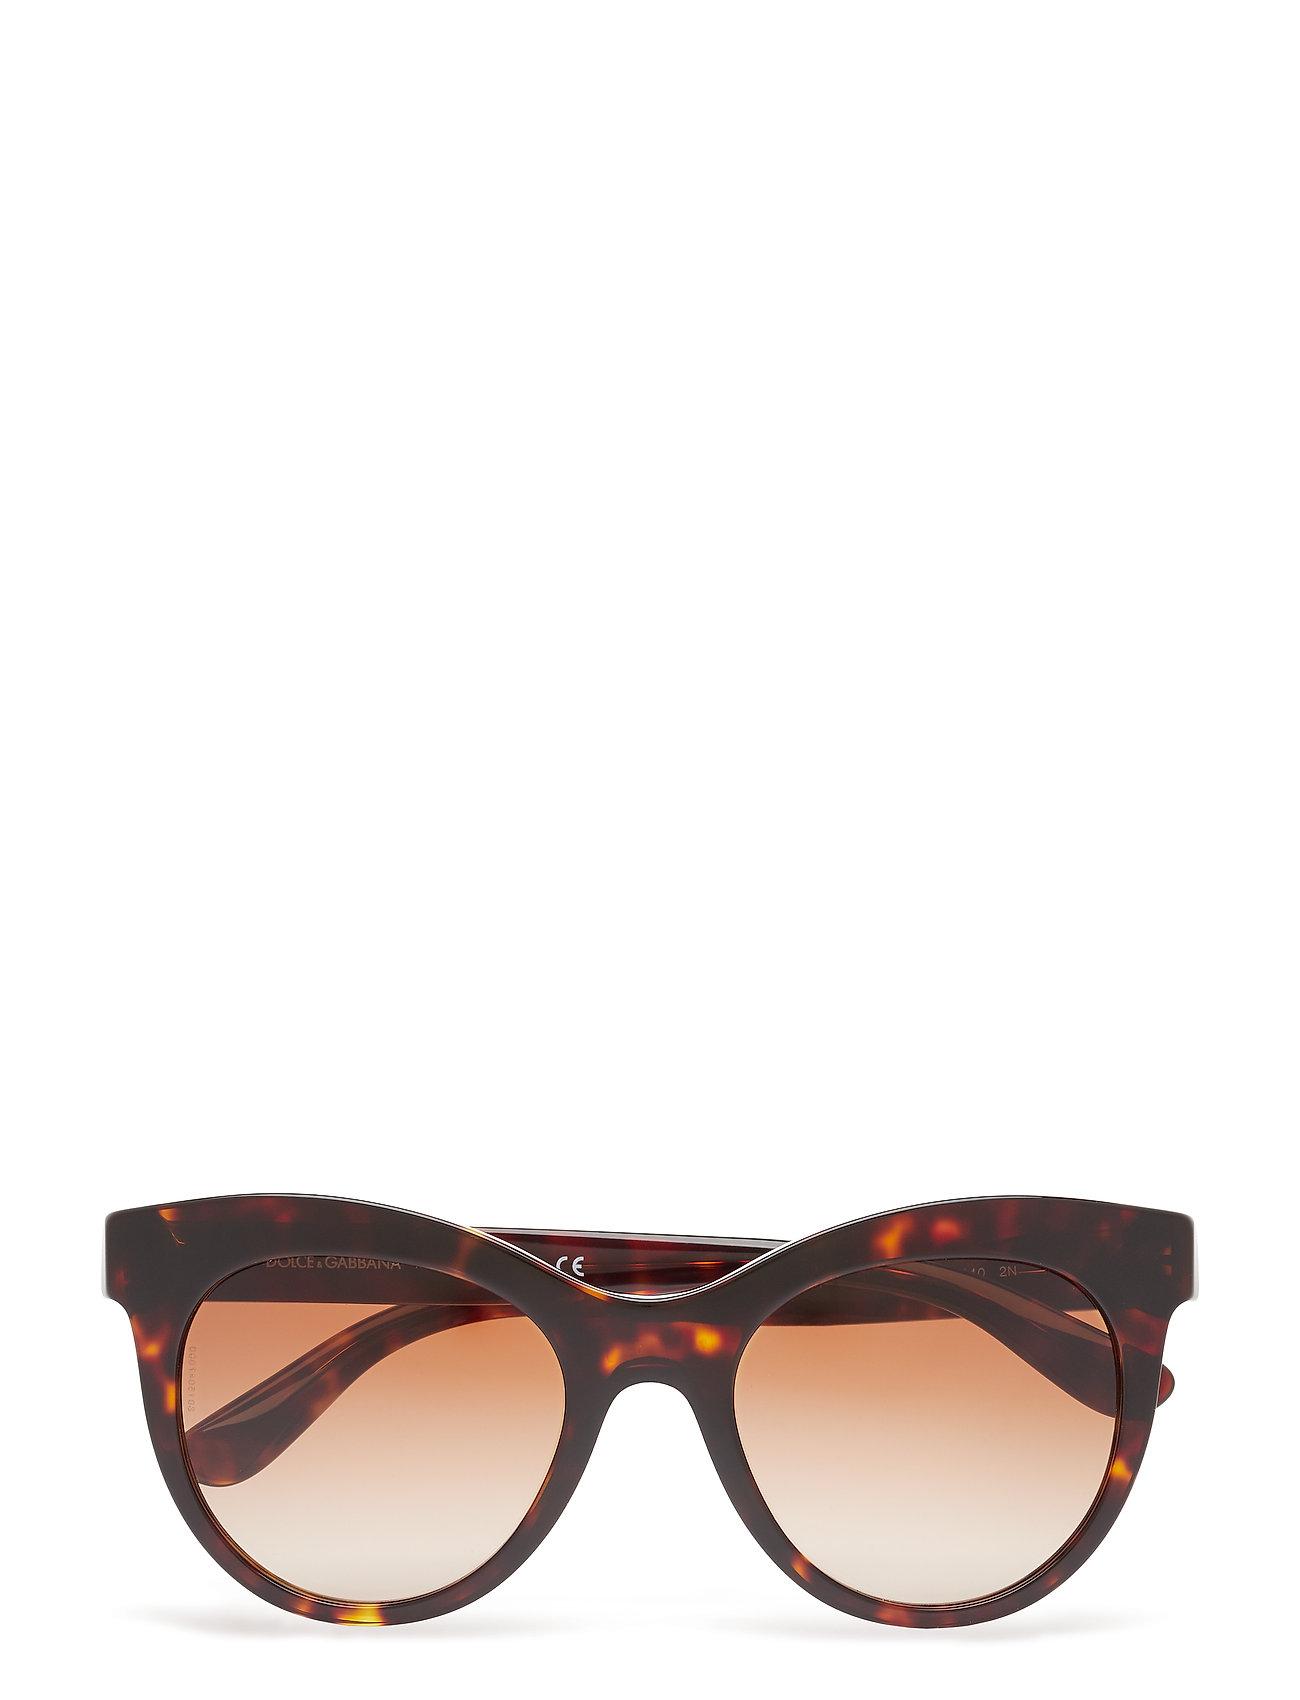 d2b7274e9be2 Sort Dolce   Gabbana 0dg4311 wayfarer solbriller for dame - Pashion.dk